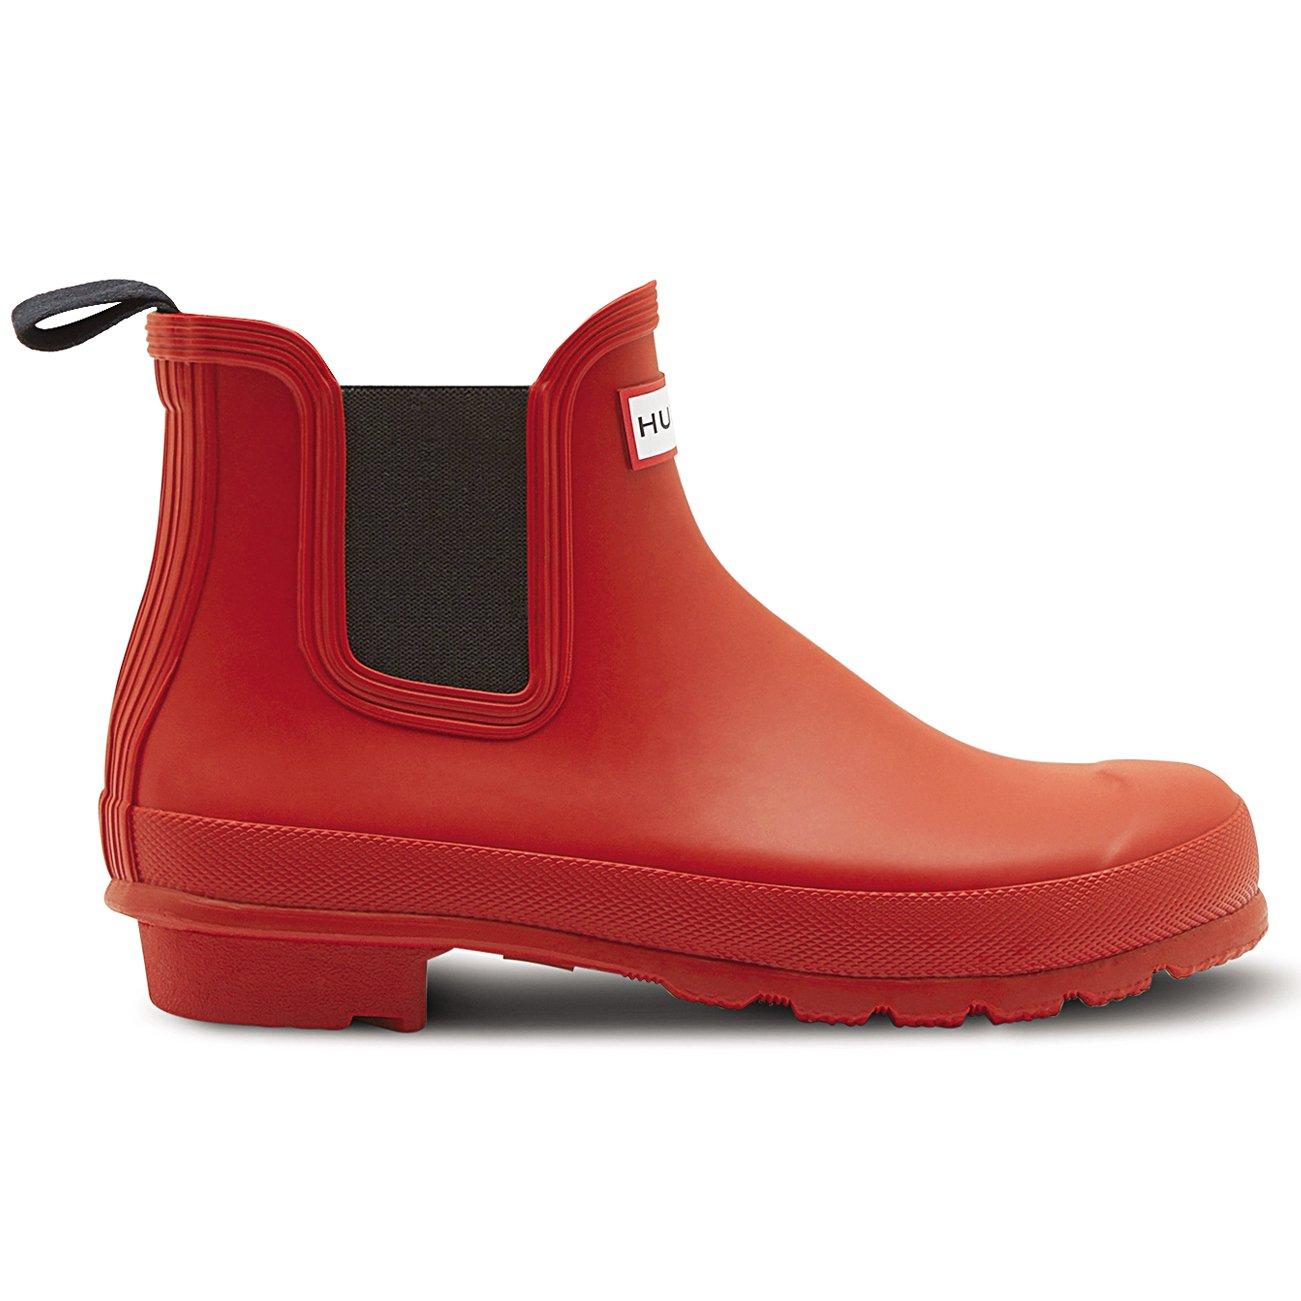 Womens Hunter Original Chelsea Wellingtons Waterproof 9 Rain Ankle Boots B01DKRFAA4 9 Waterproof B(M) US|Military Red f2cc89